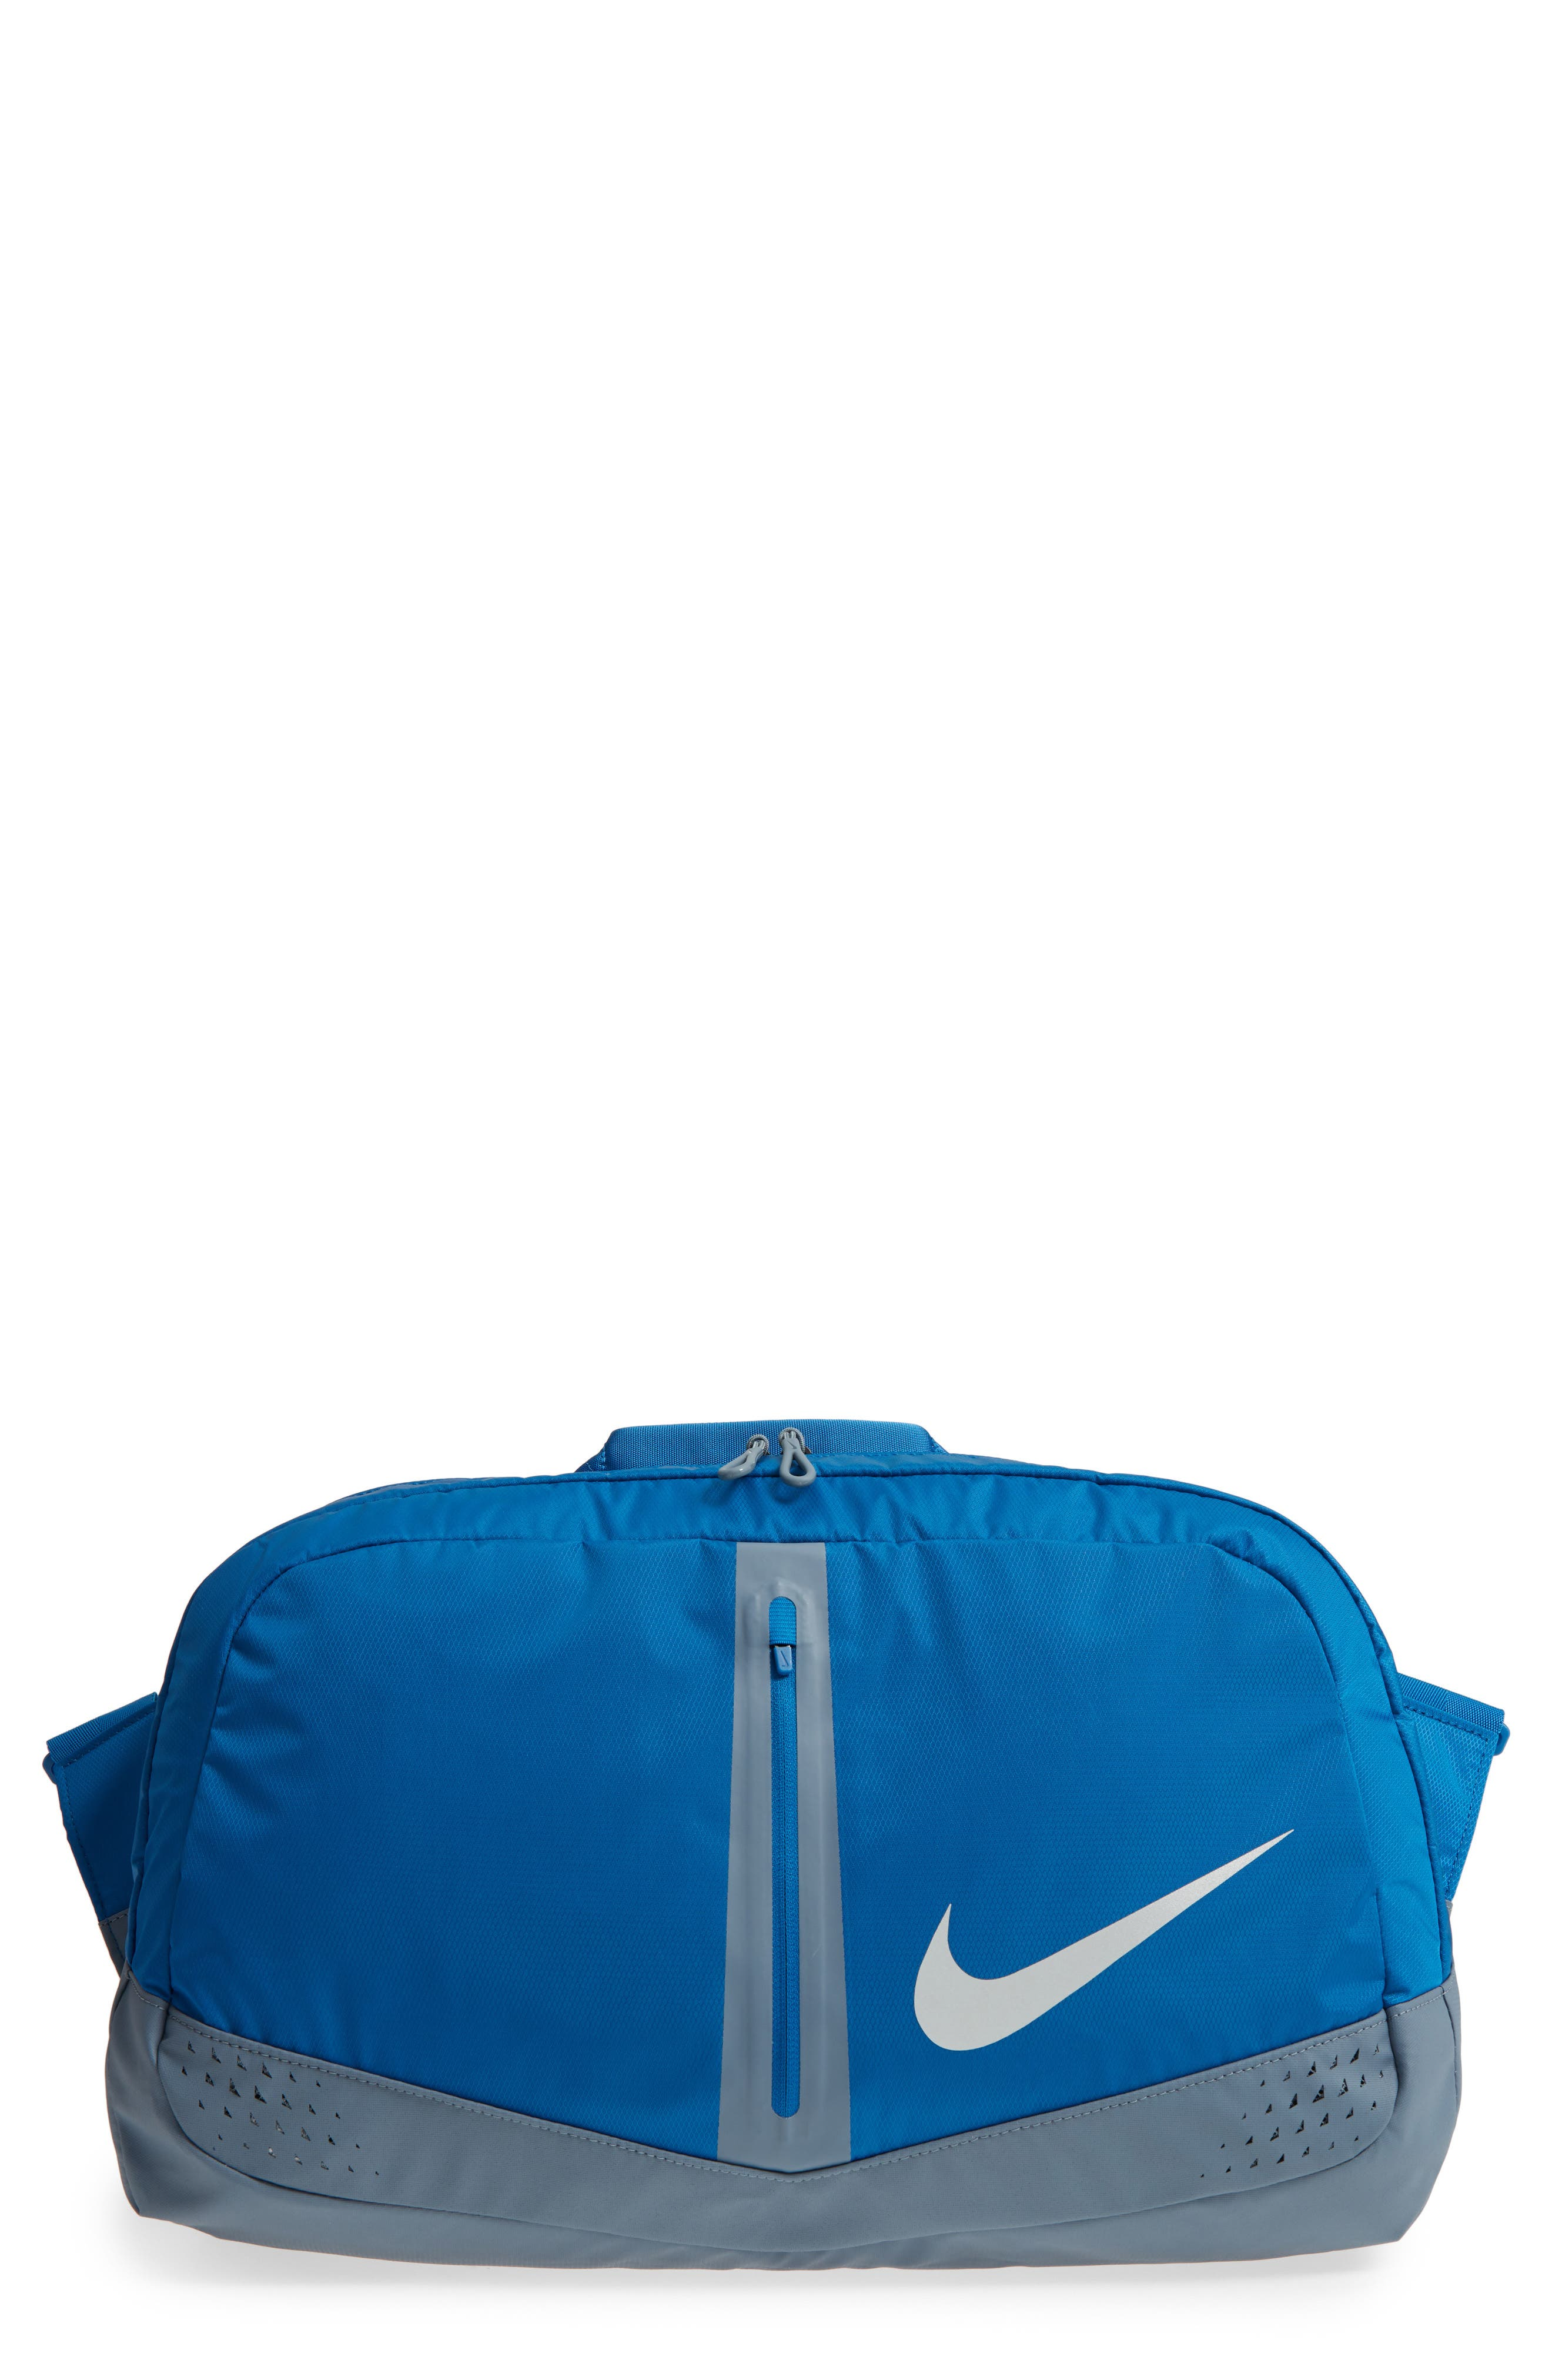 Run Duffel Bag,                         Main,                         color, Blue Jay/ Armory Blue/ Silver